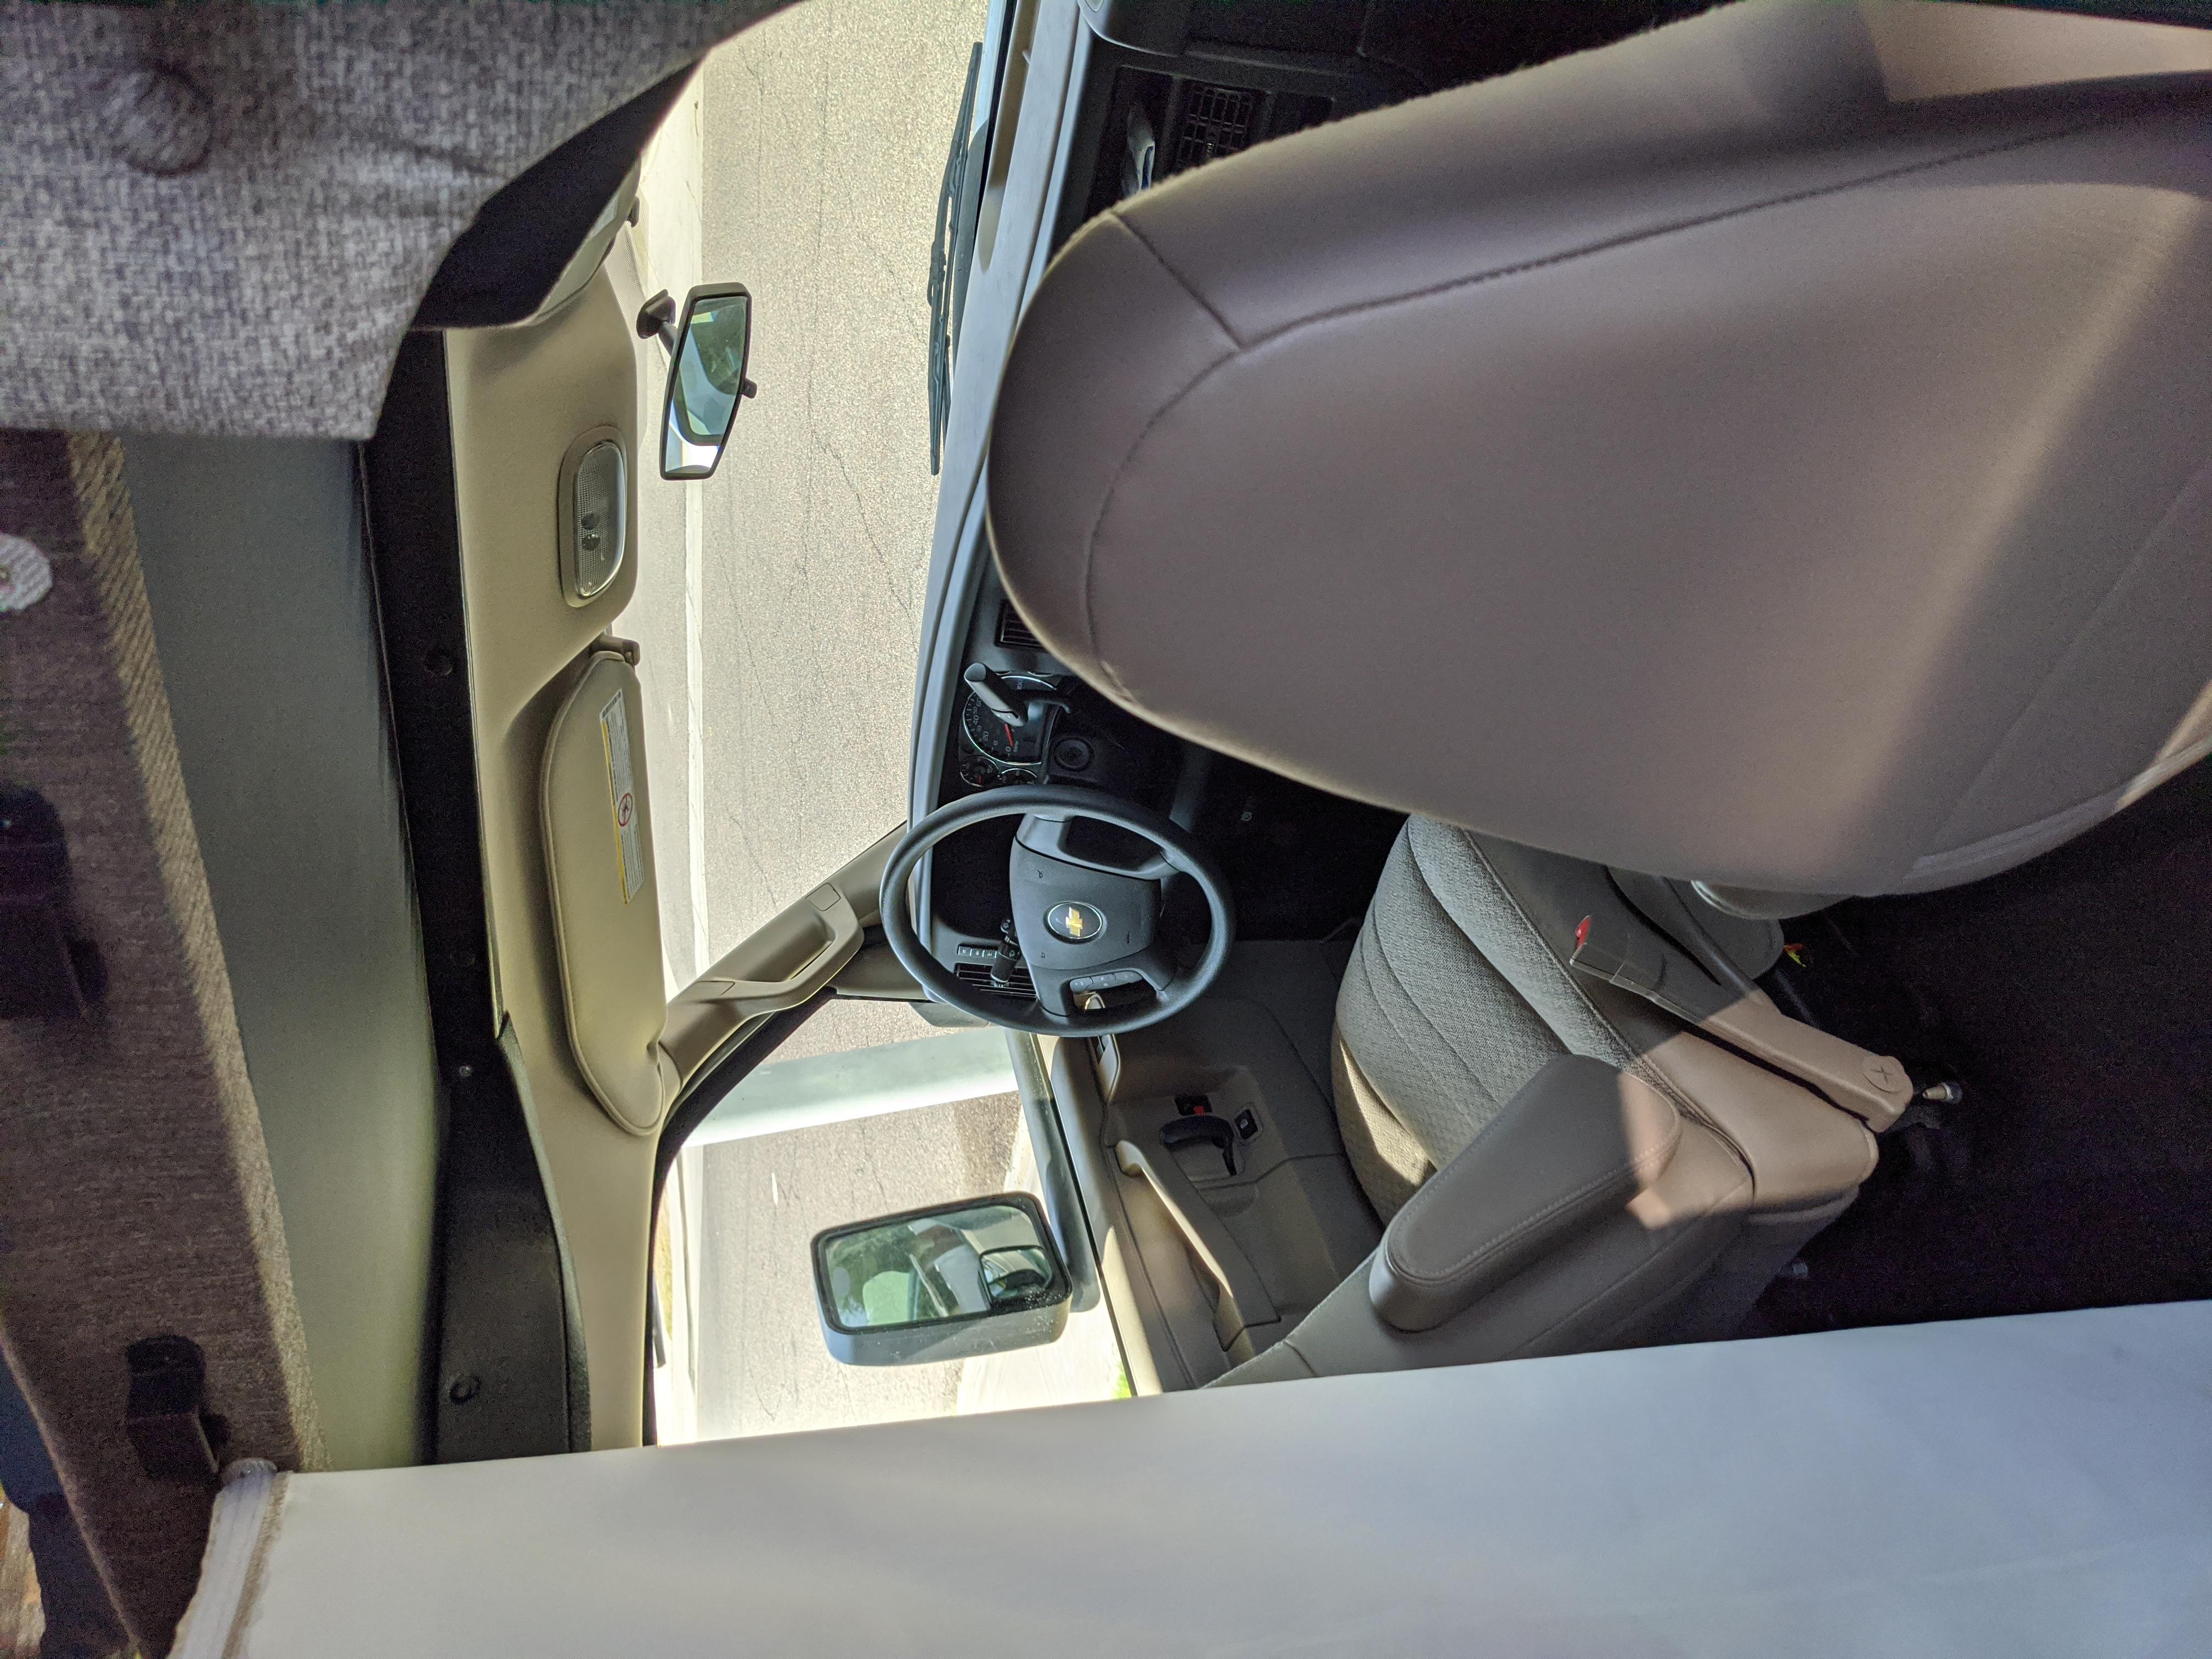 Comfortable Driver and Passenger Seat. Coachmen Freelander 2020